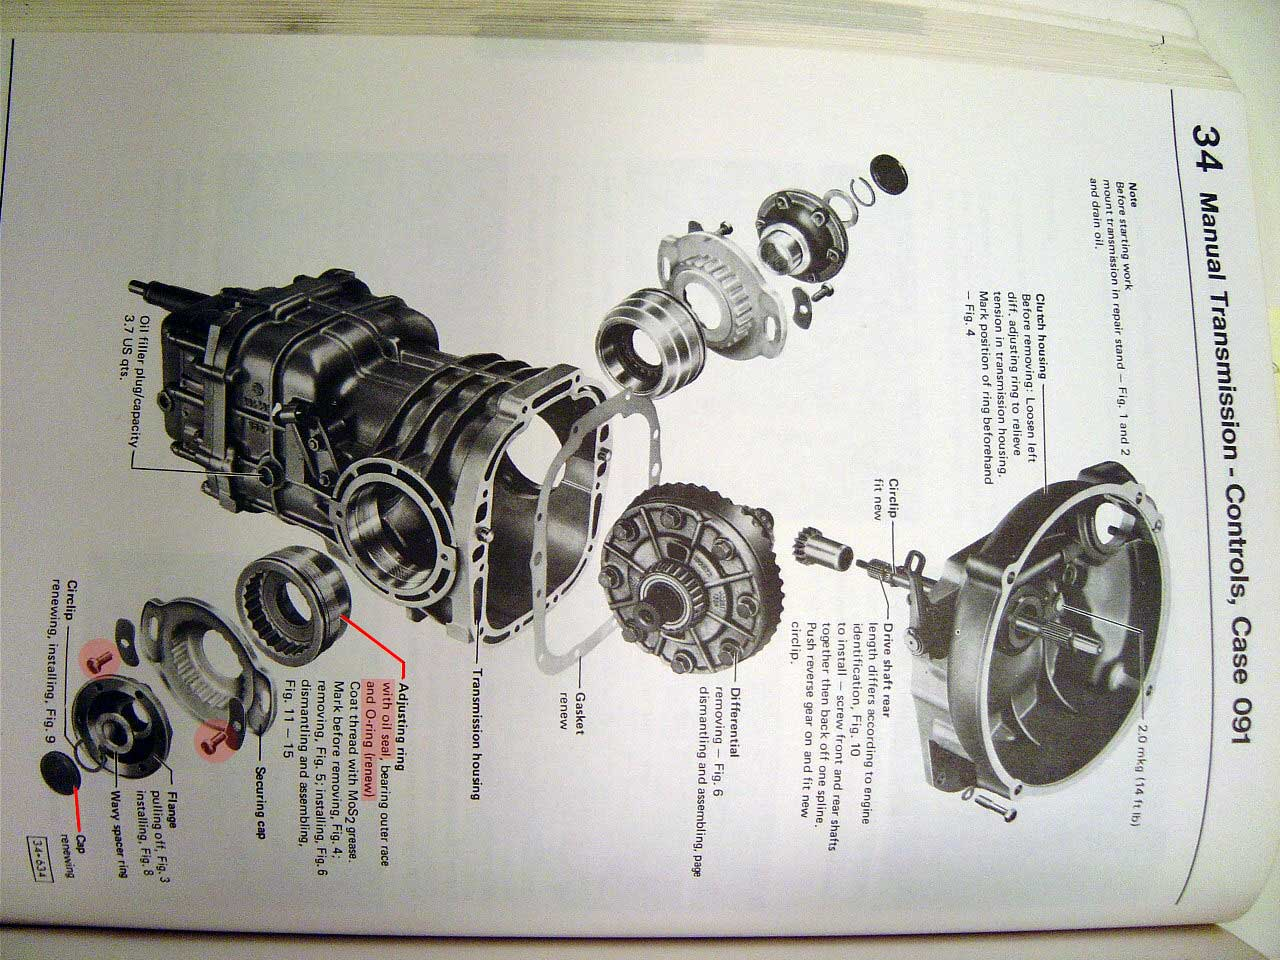 Vw Beetle Wiring Diagram Vw Beetle Automatic Transmission 1973 Vw